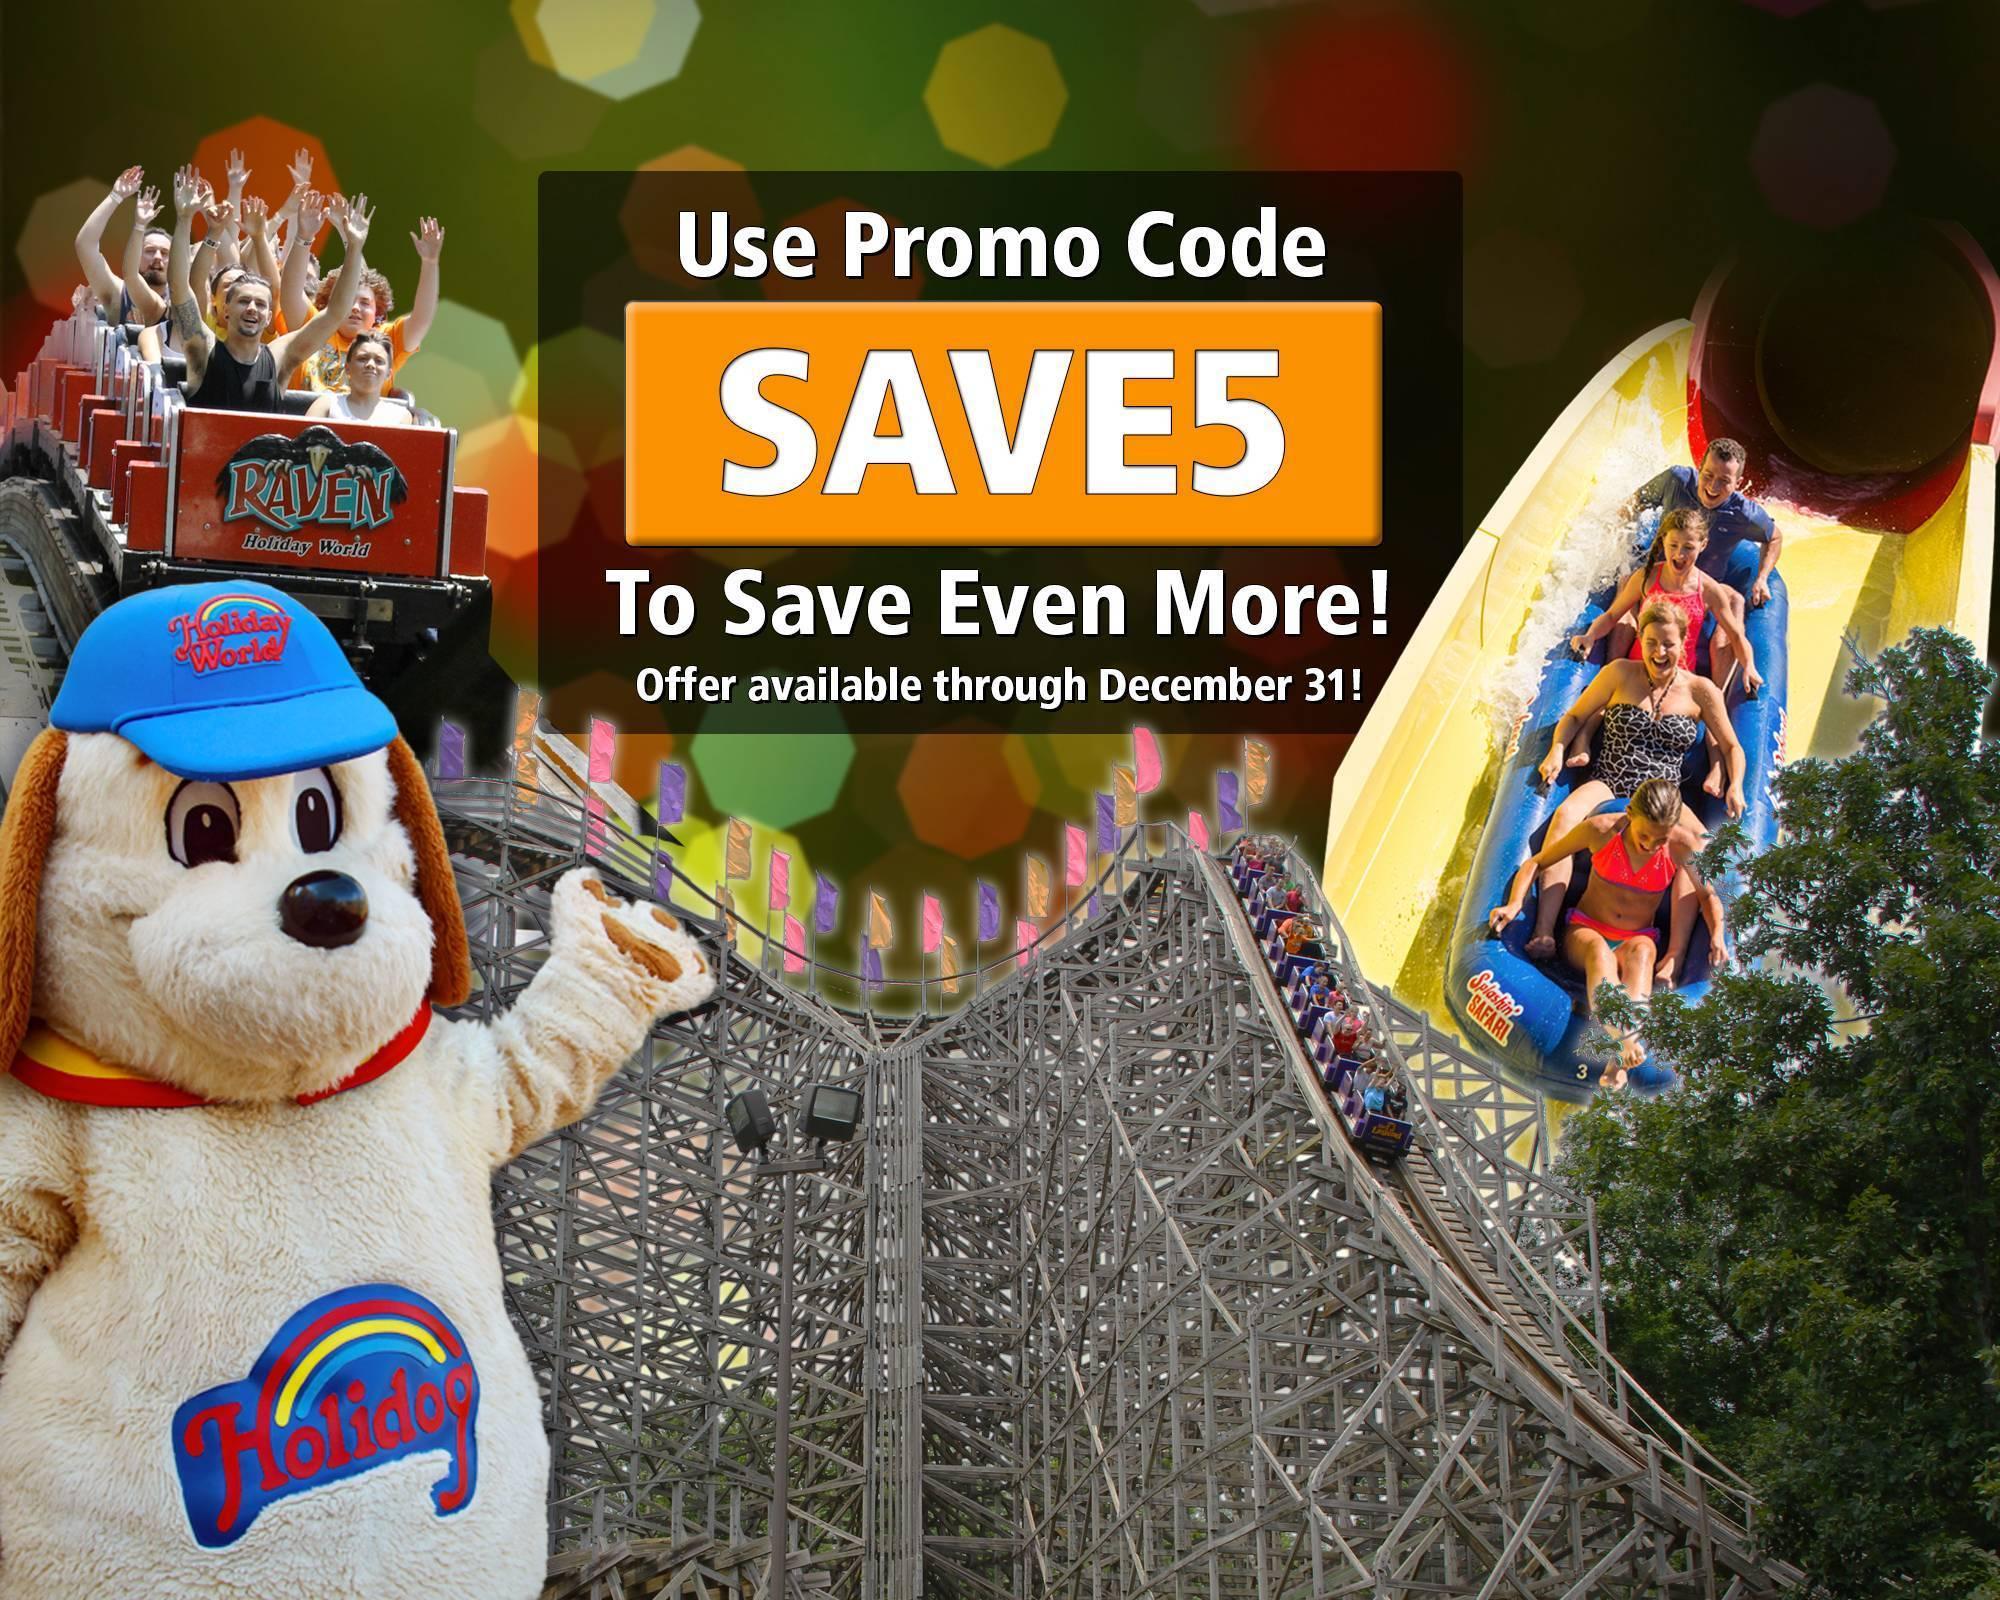 SAVE5 Promo Code